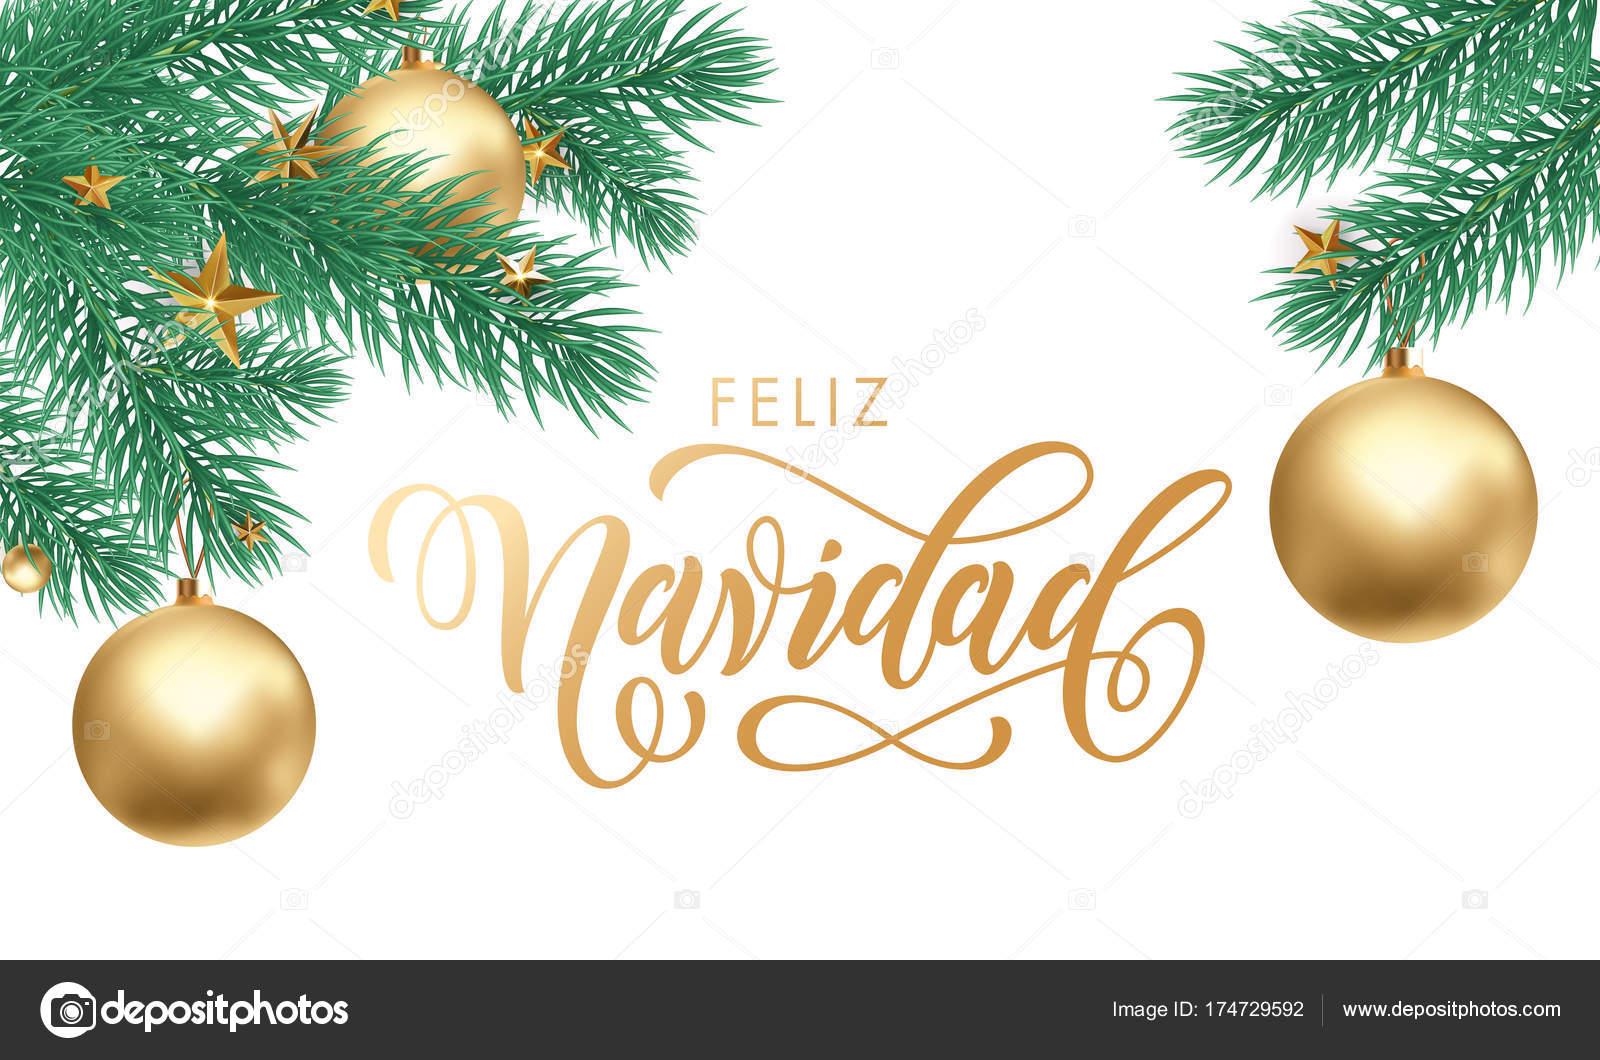 Merry Christmas In Spanish.Feliz Navidad Spanish Merry Christmas Hand Drawn Golden